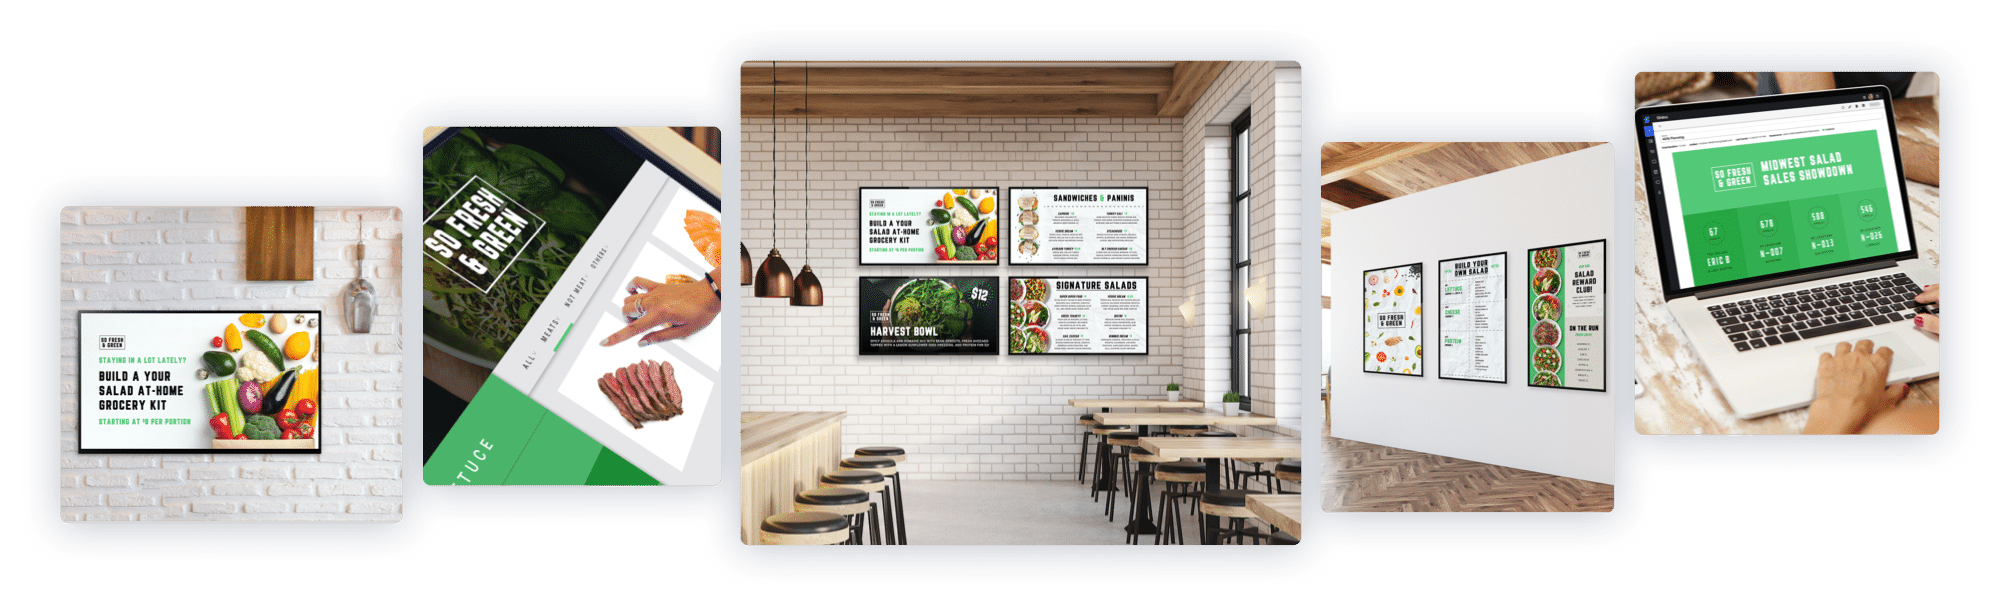 Skykit Beam Digital Signage Content Management Solution for Restaurants and Digital Menu Boards